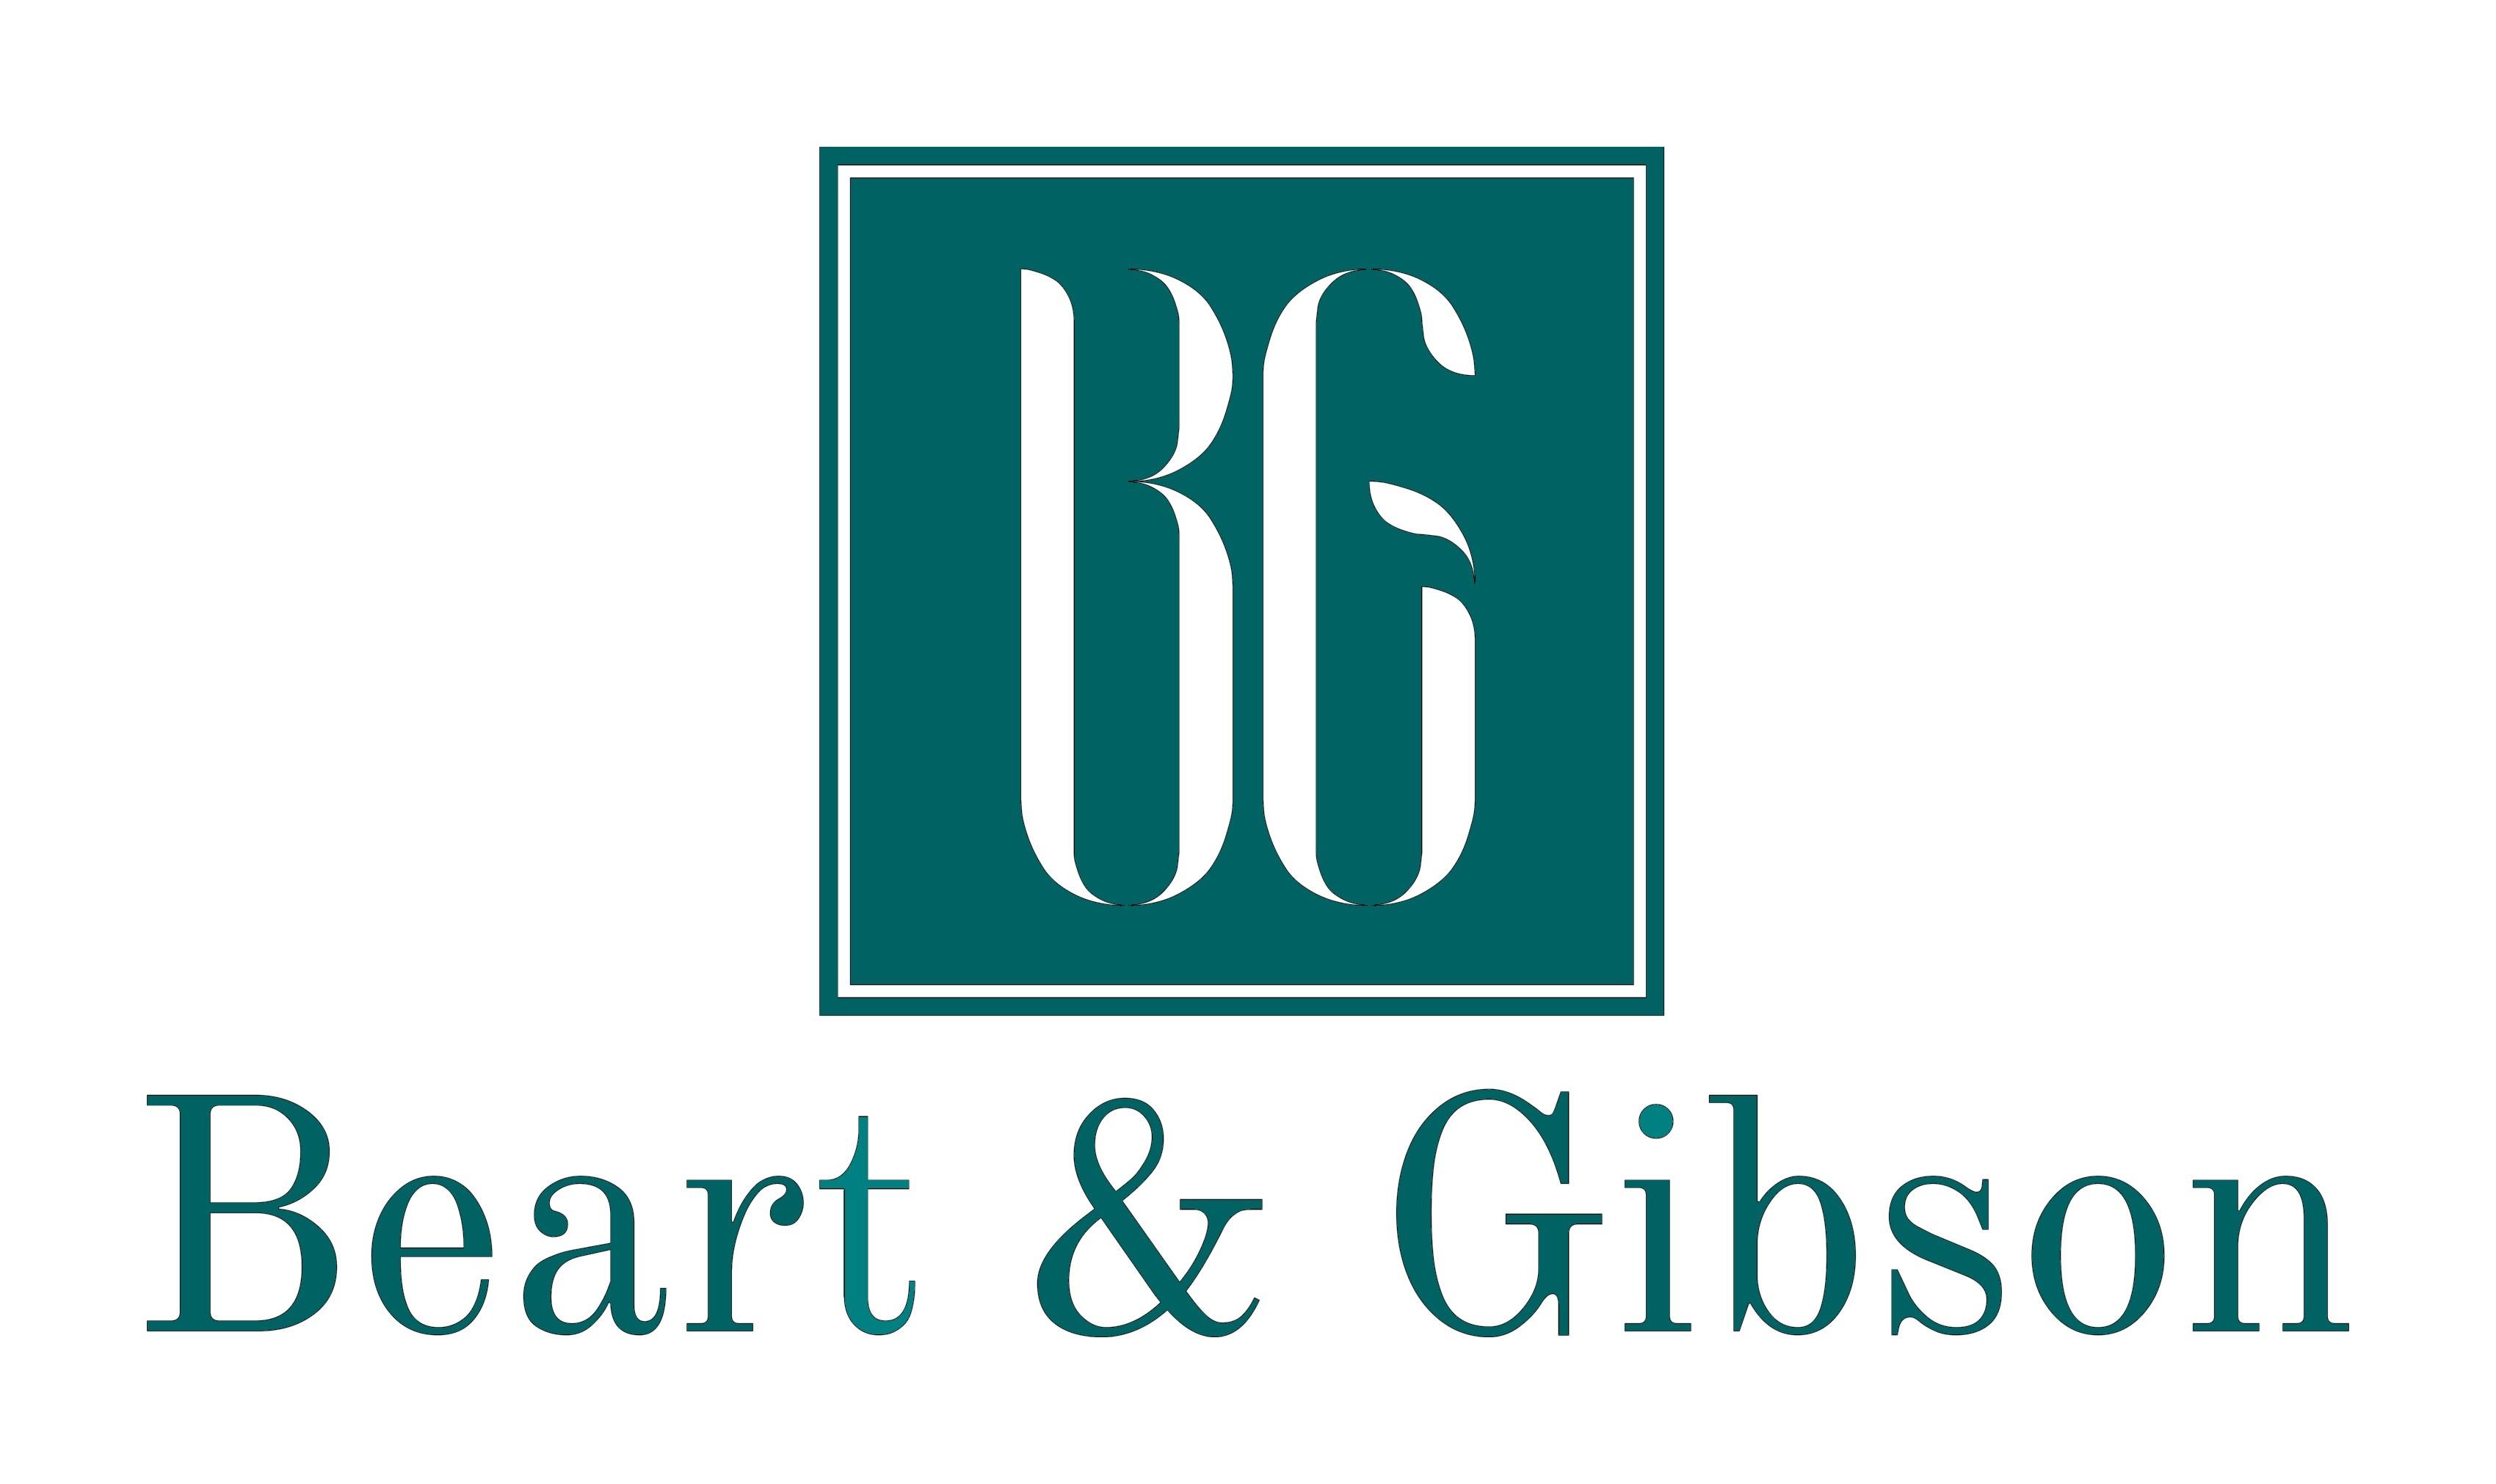 Beart and Gibson doo